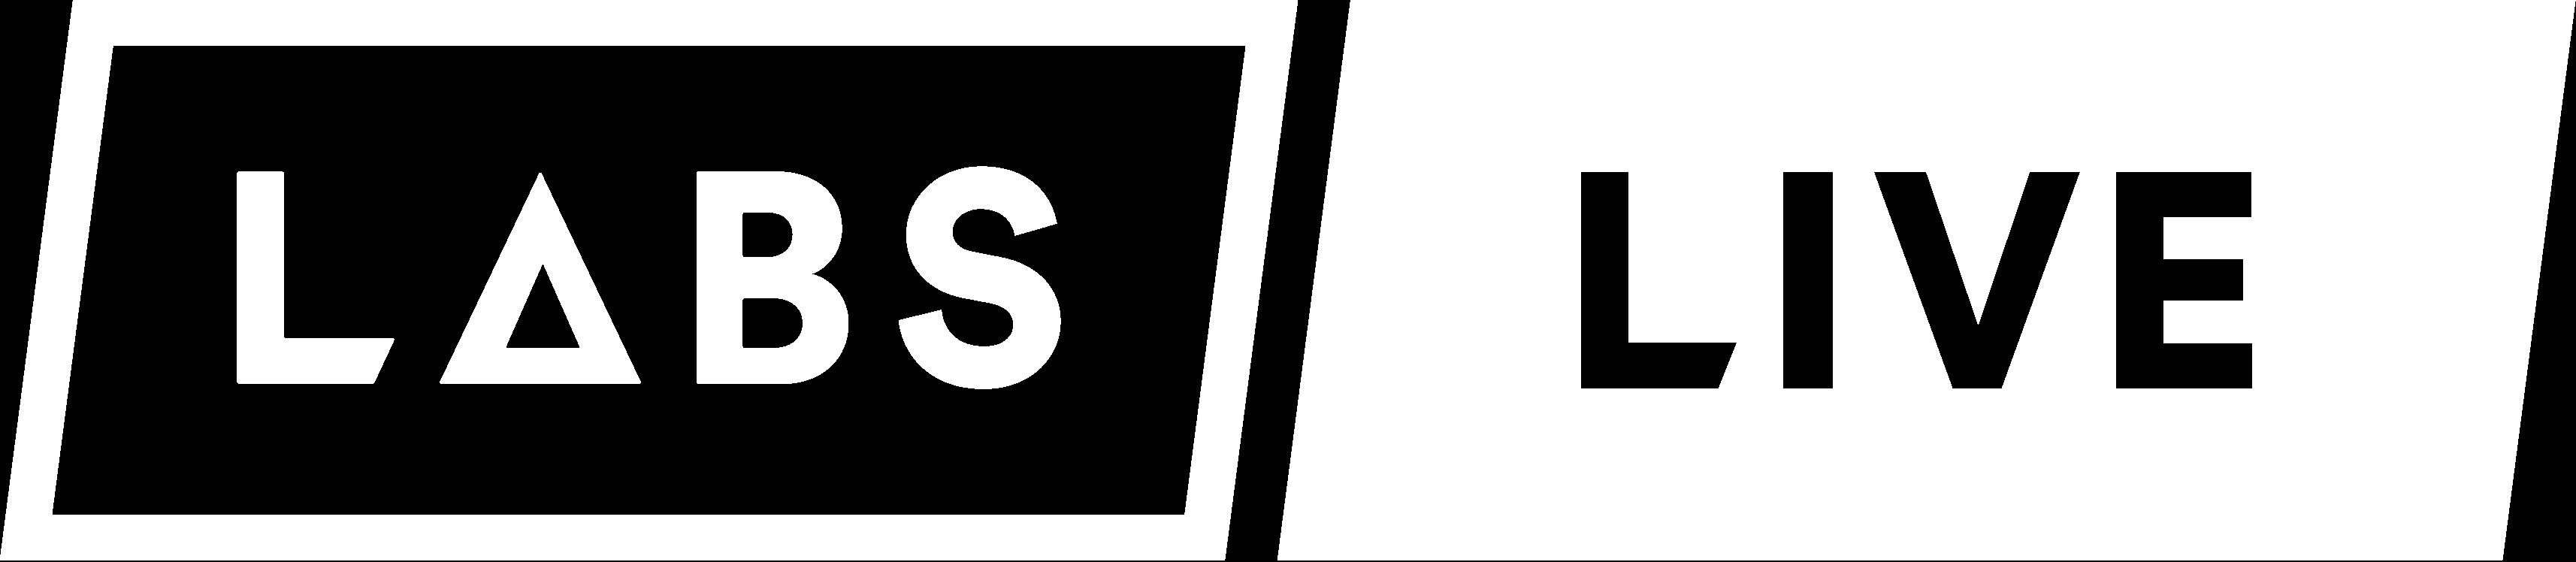 Labs Live Logo